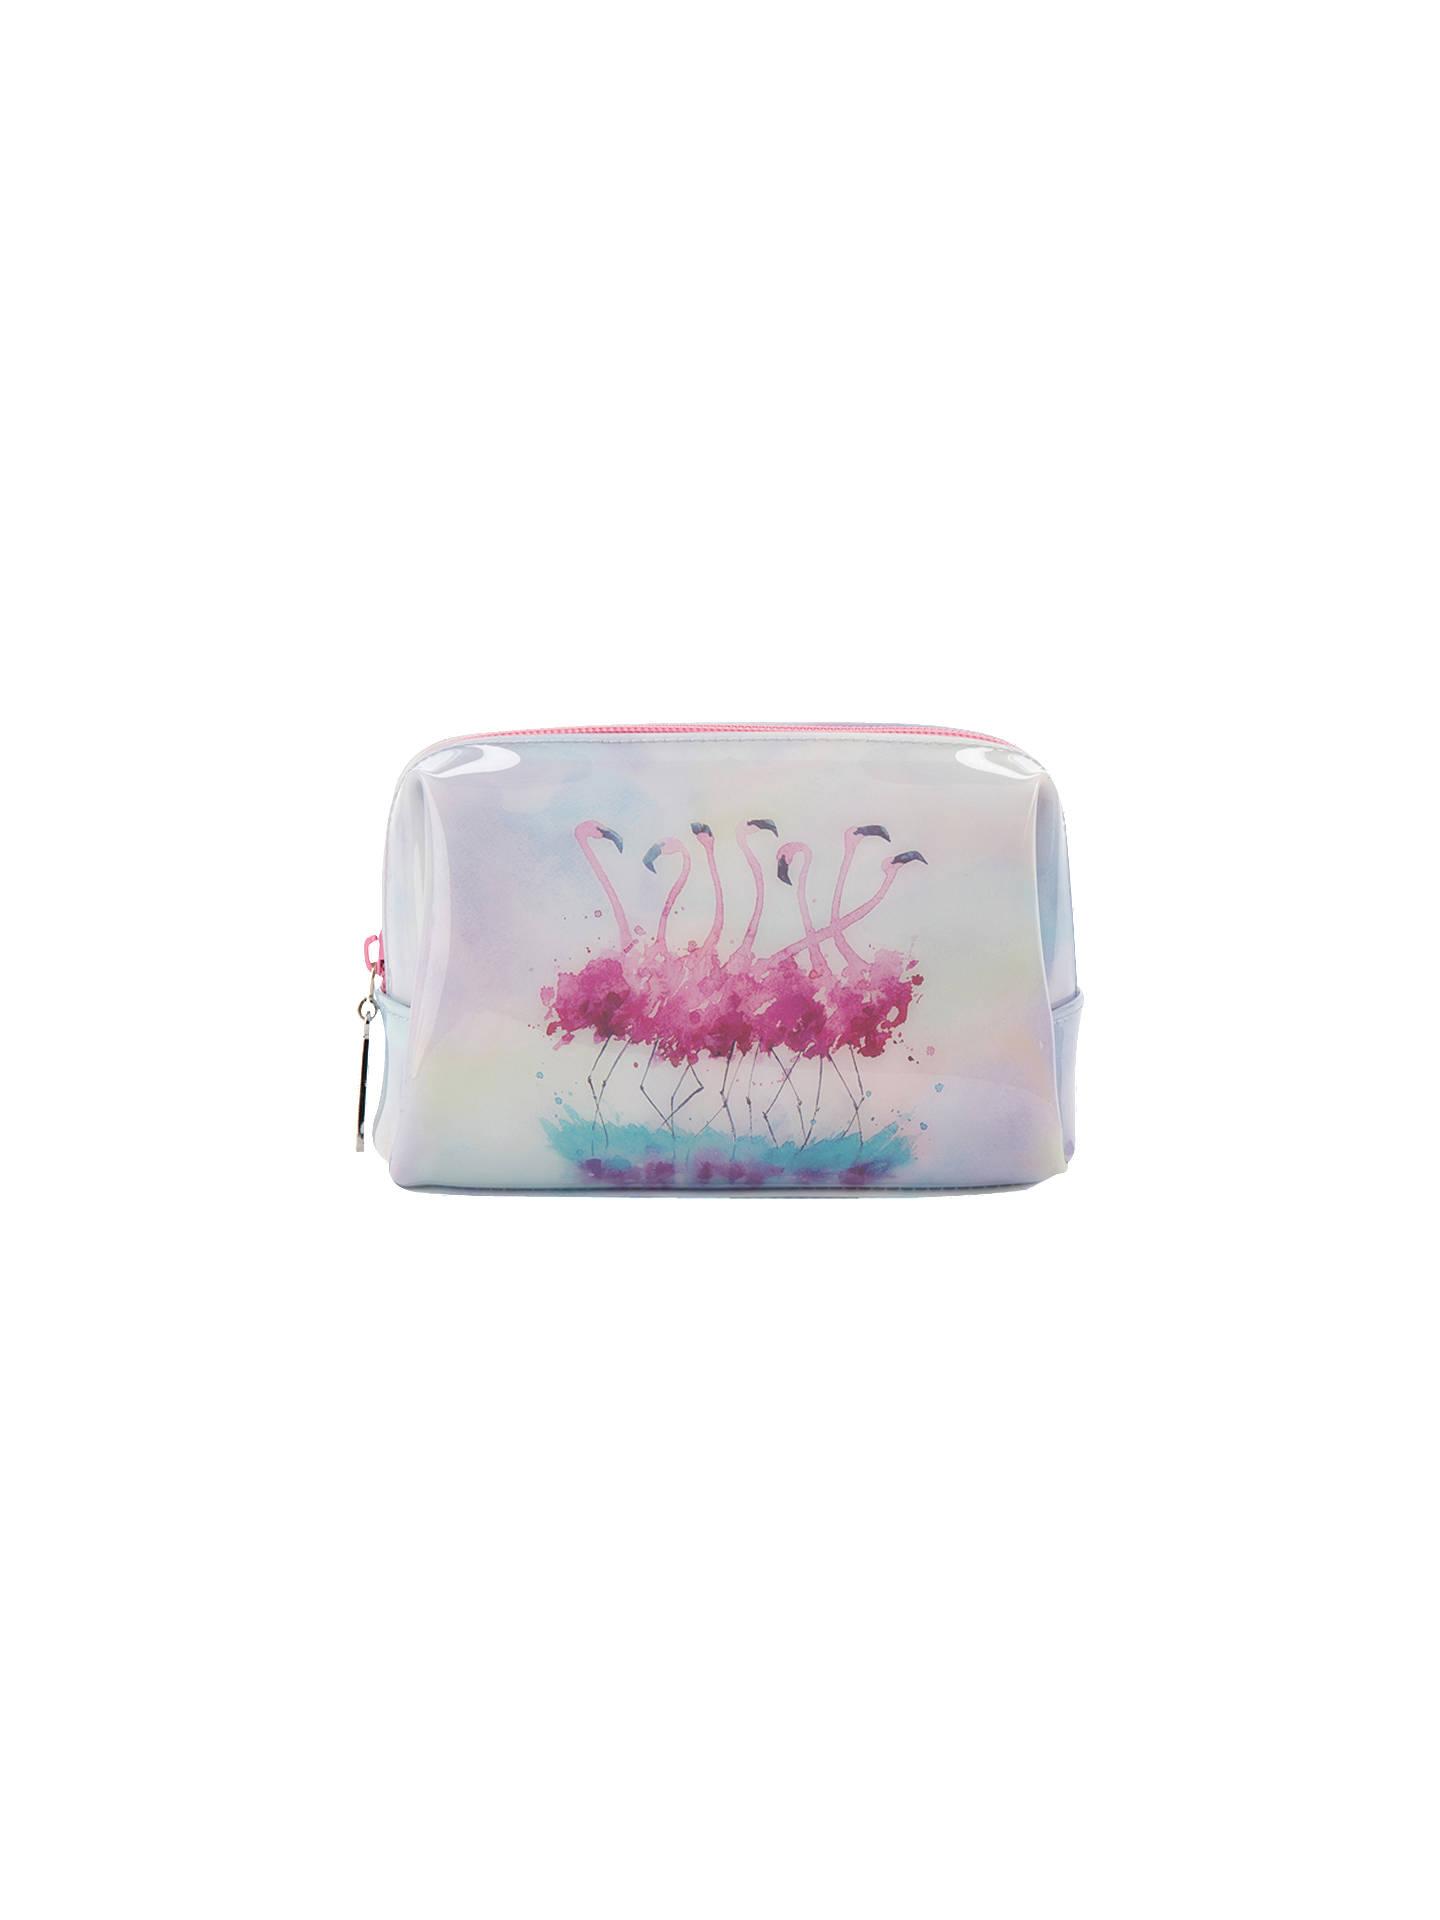 Catseye London Flamingo Cosmetic Bag At John Lewis Partners